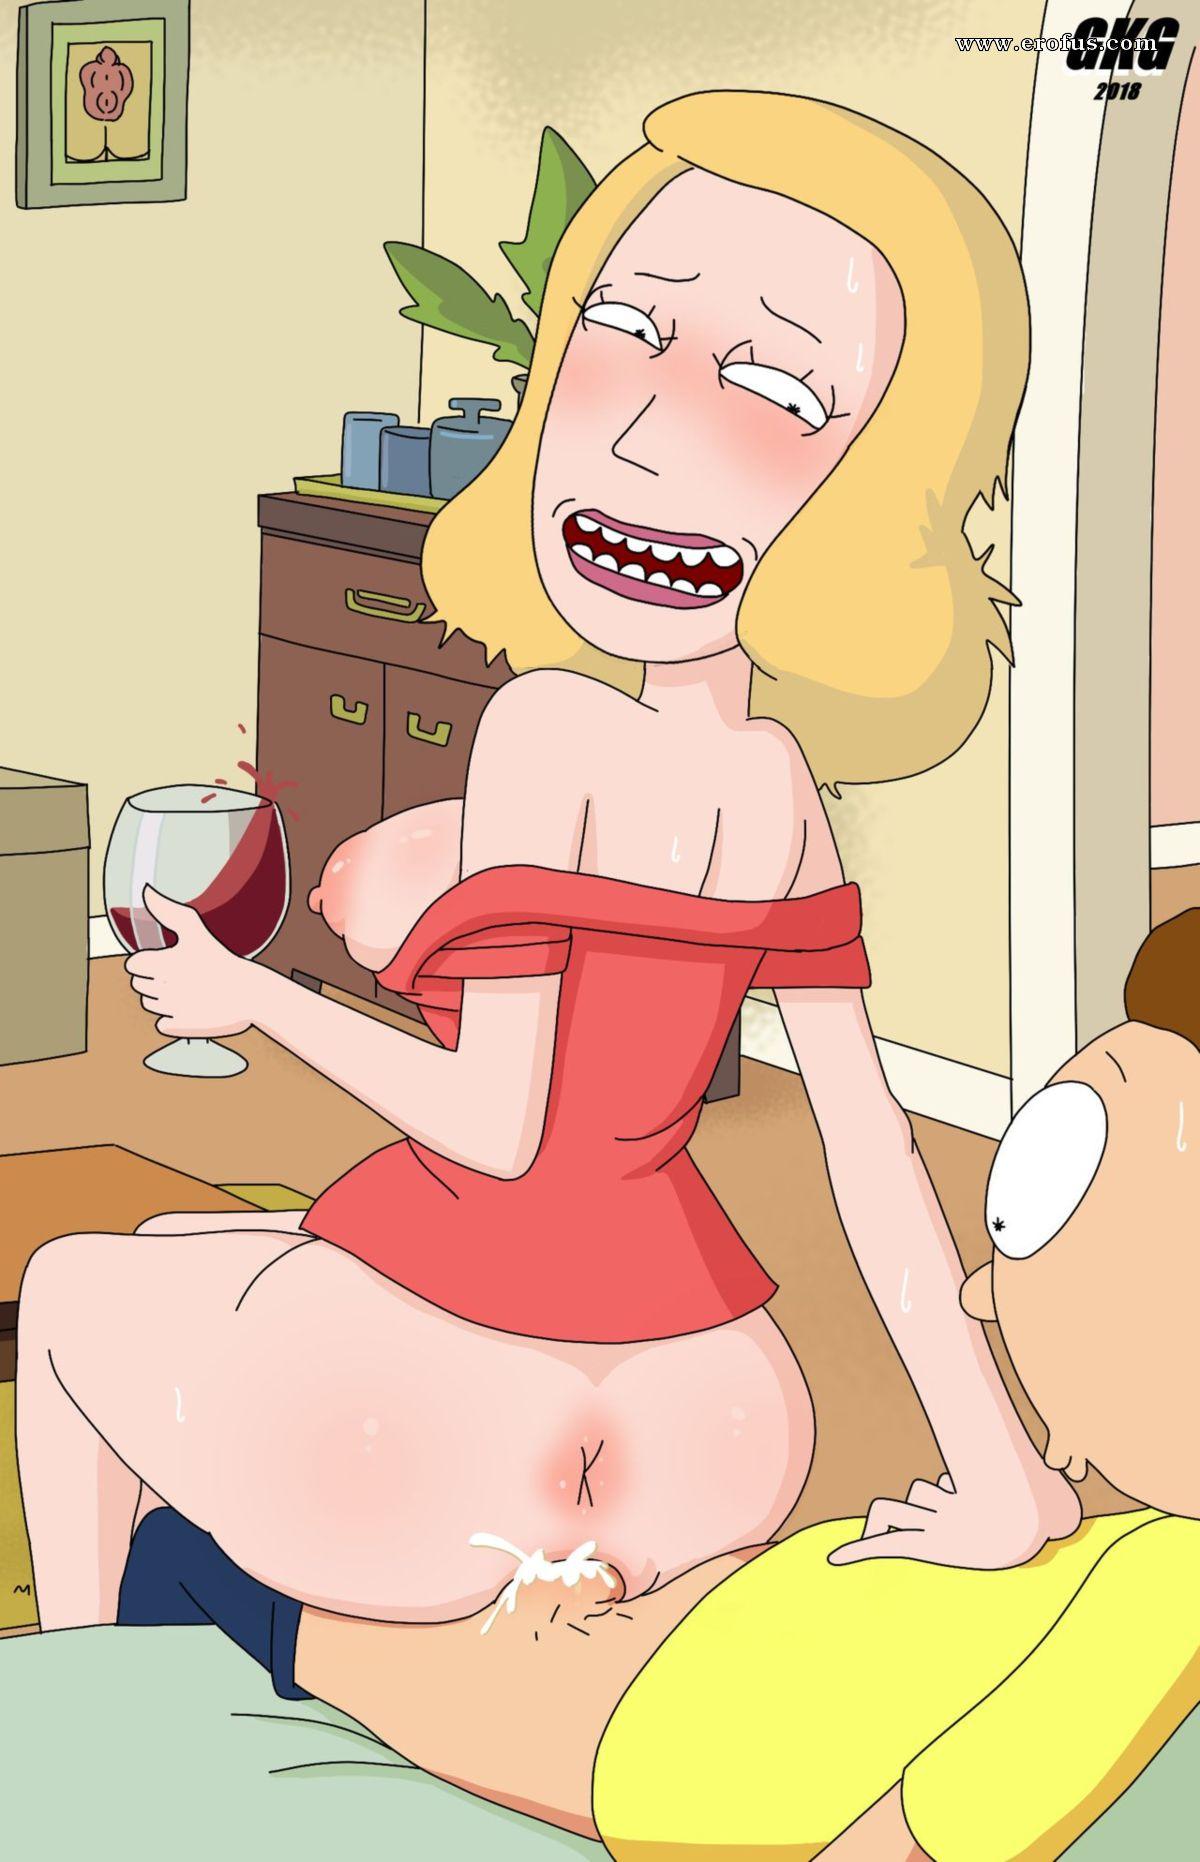 Beth smith porn and nude videos